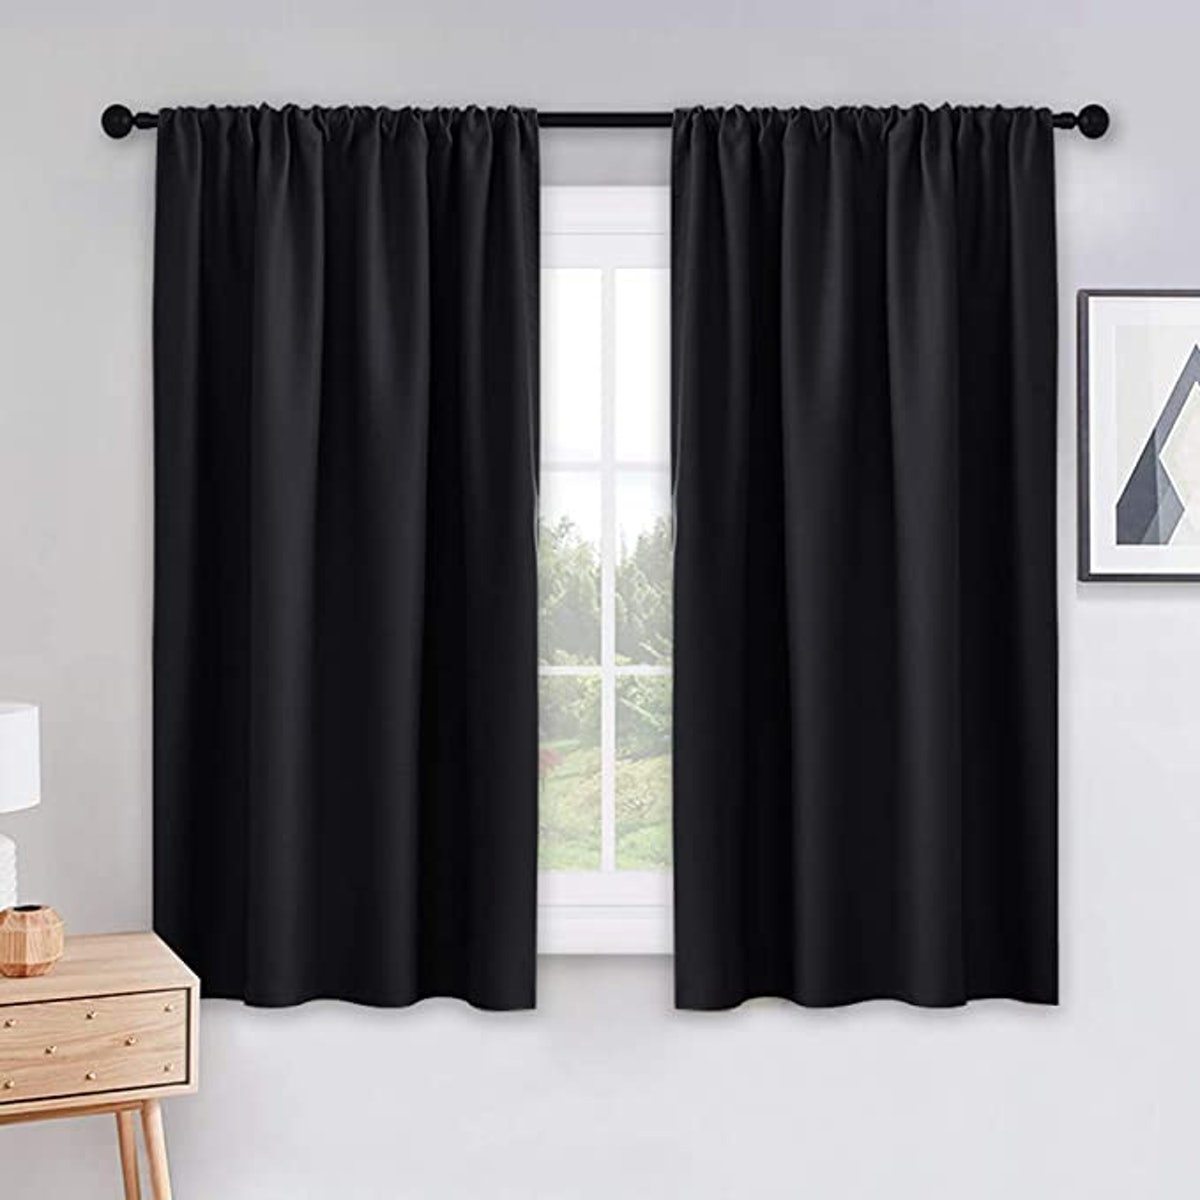 PONY DANCE Bedroom Blackout Curtains (2-Piece)